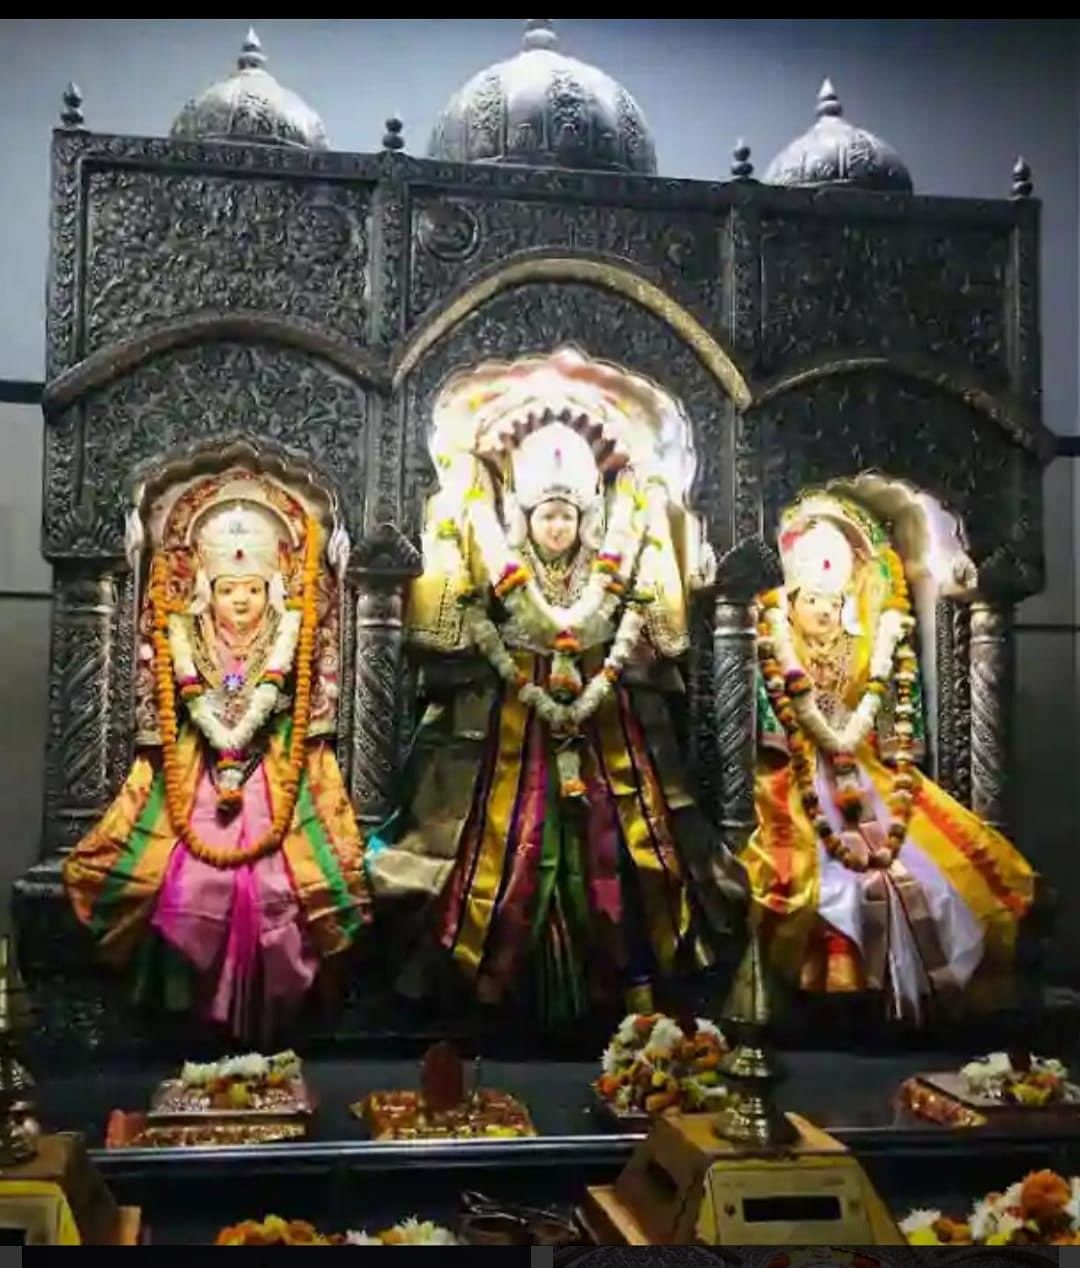 कालिका मंदिर दर्शनासाठी बंद